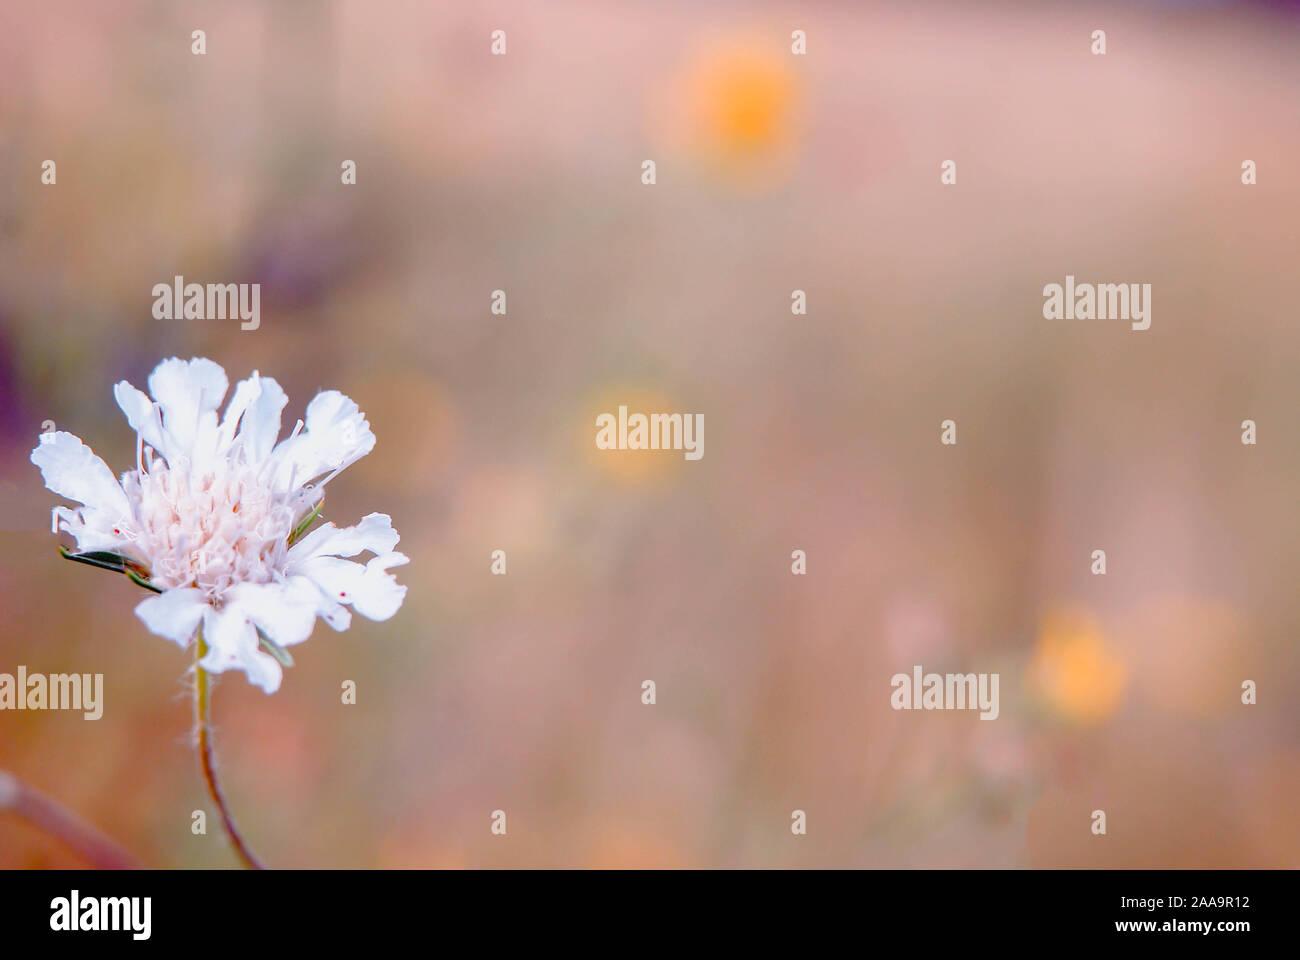 Background Of White Wildflowers Blank Template Pattern Desktop